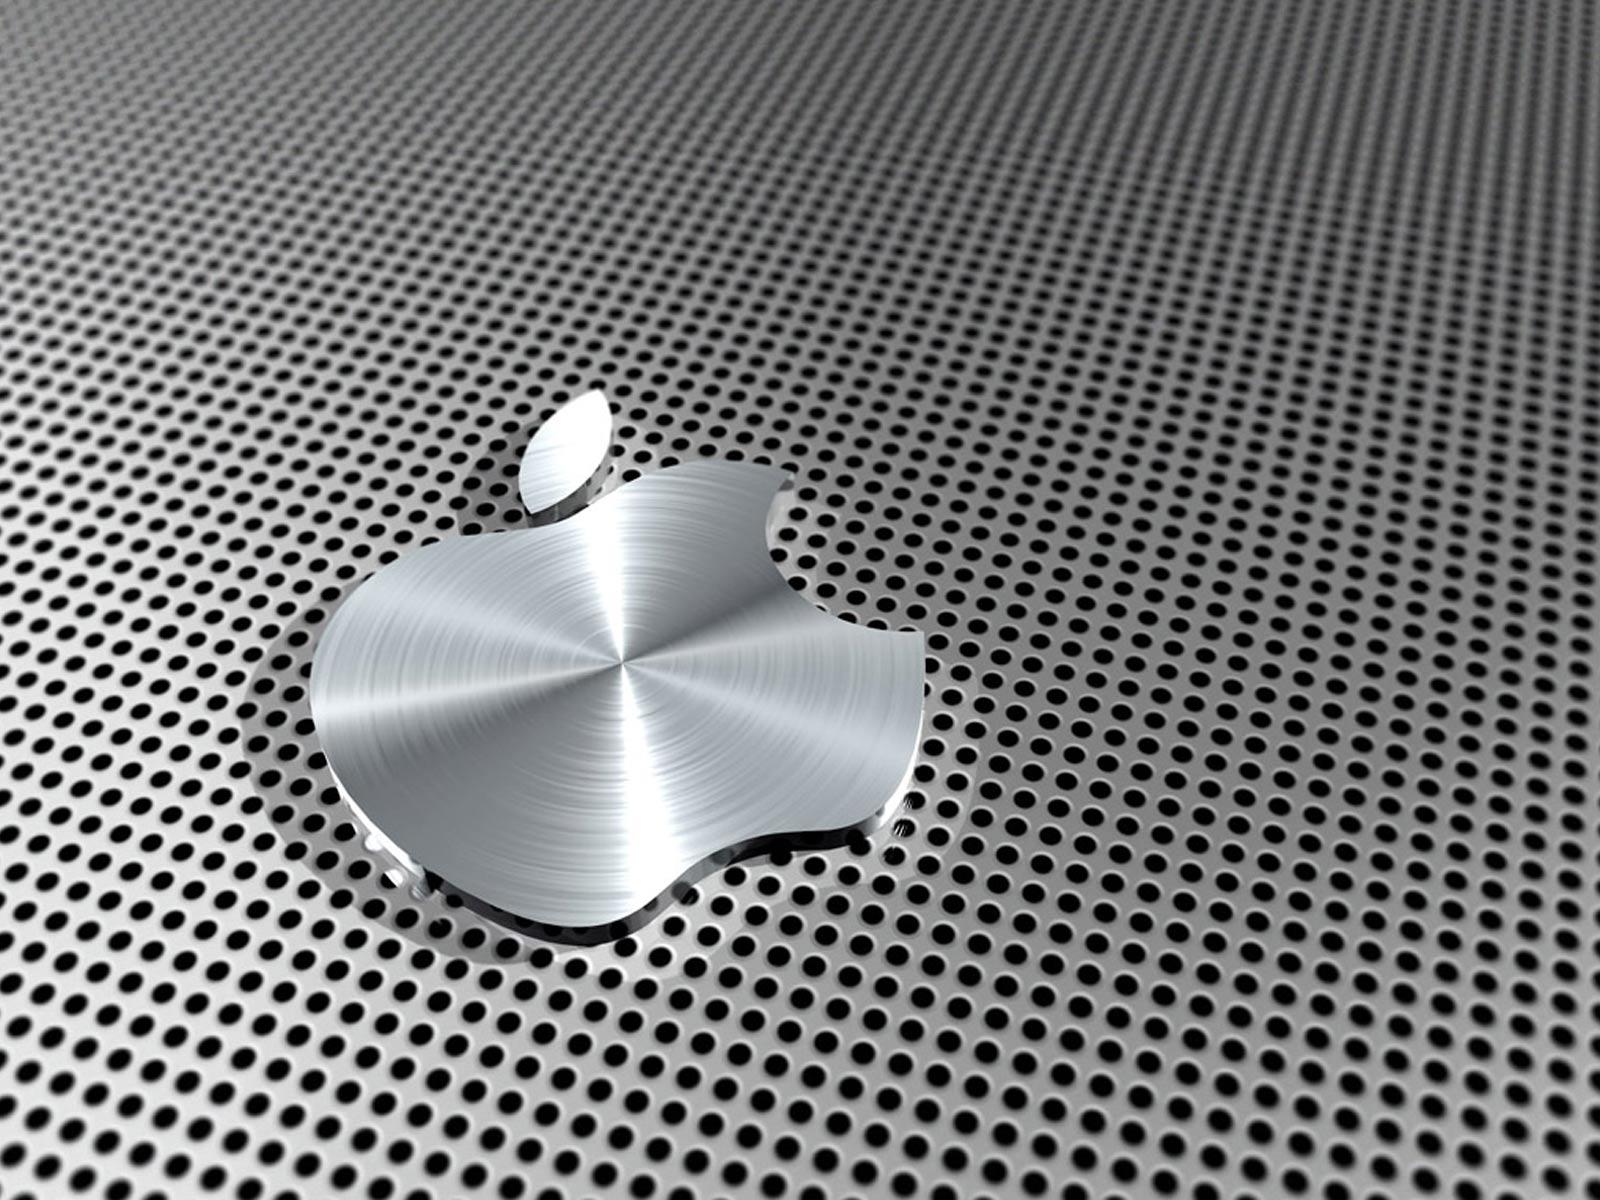 apple wallpaper desktop black apple wallpaper apple mac wallpaper 1600x1200